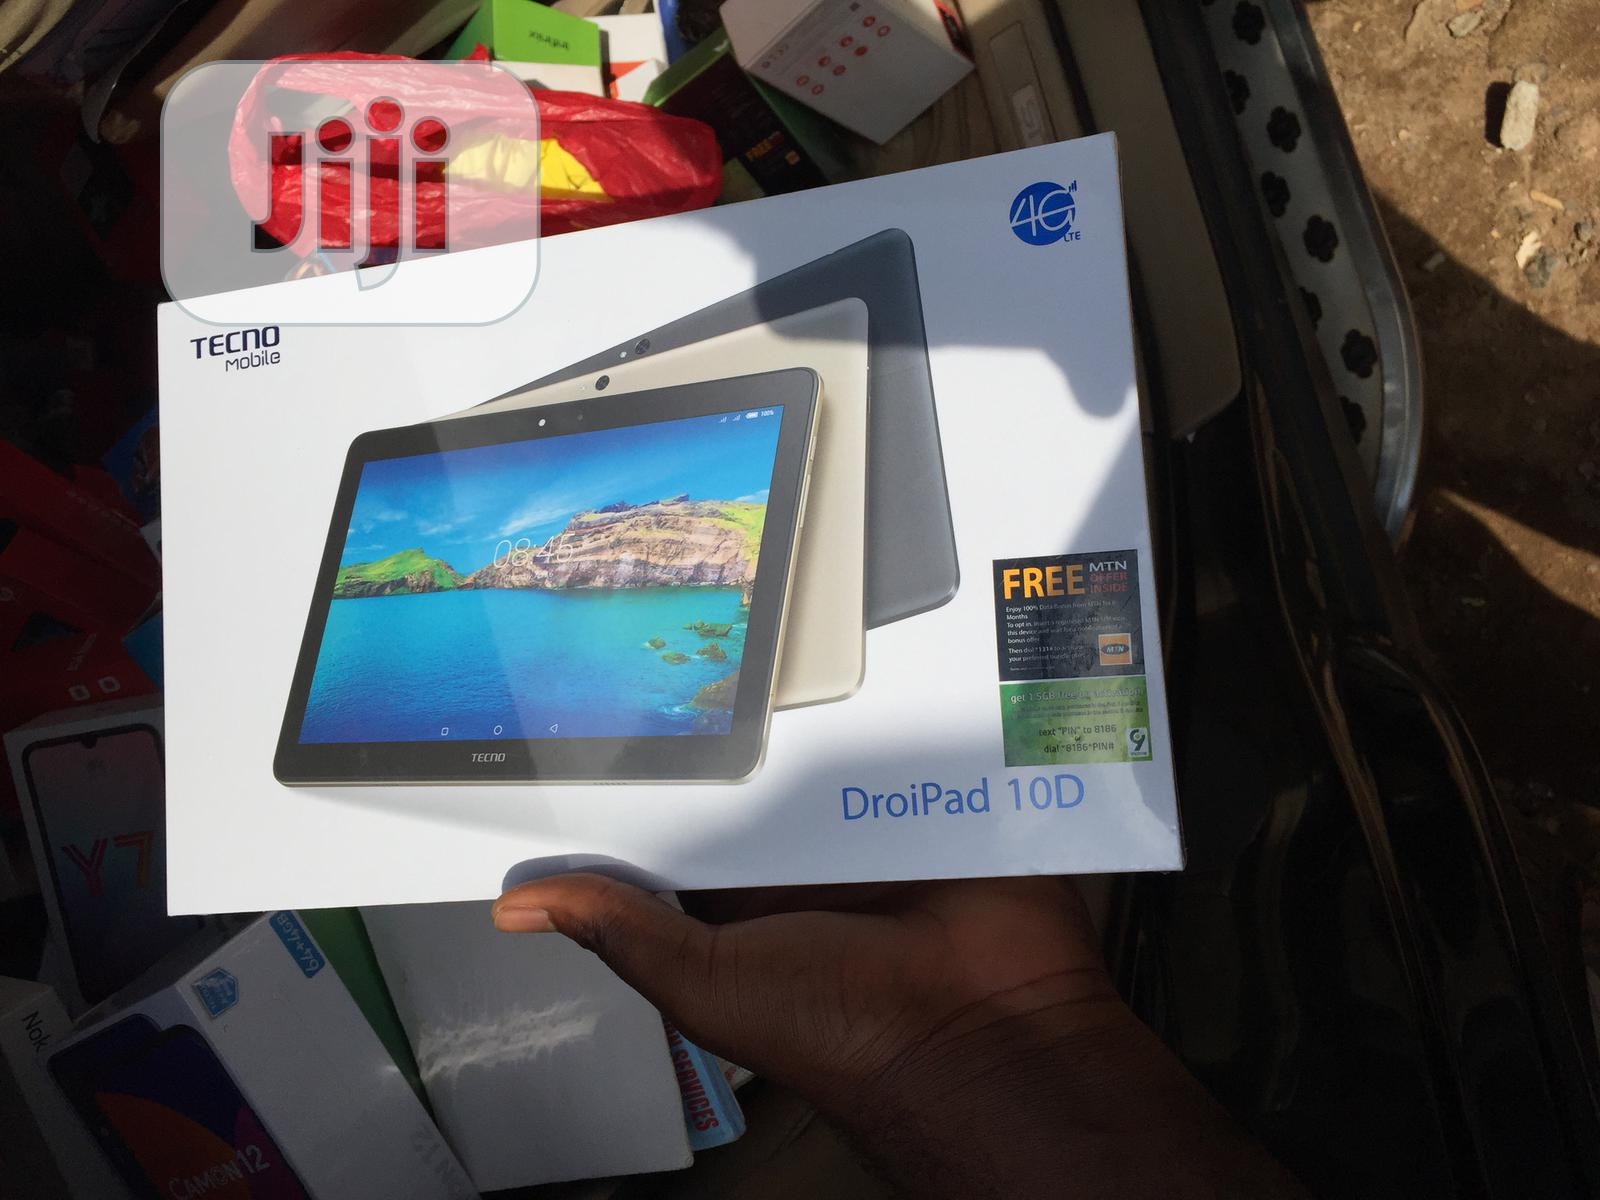 New Tecno DroiPad 10D 16 GB | Tablets for sale in Kubwa, Abuja (FCT) State, Nigeria